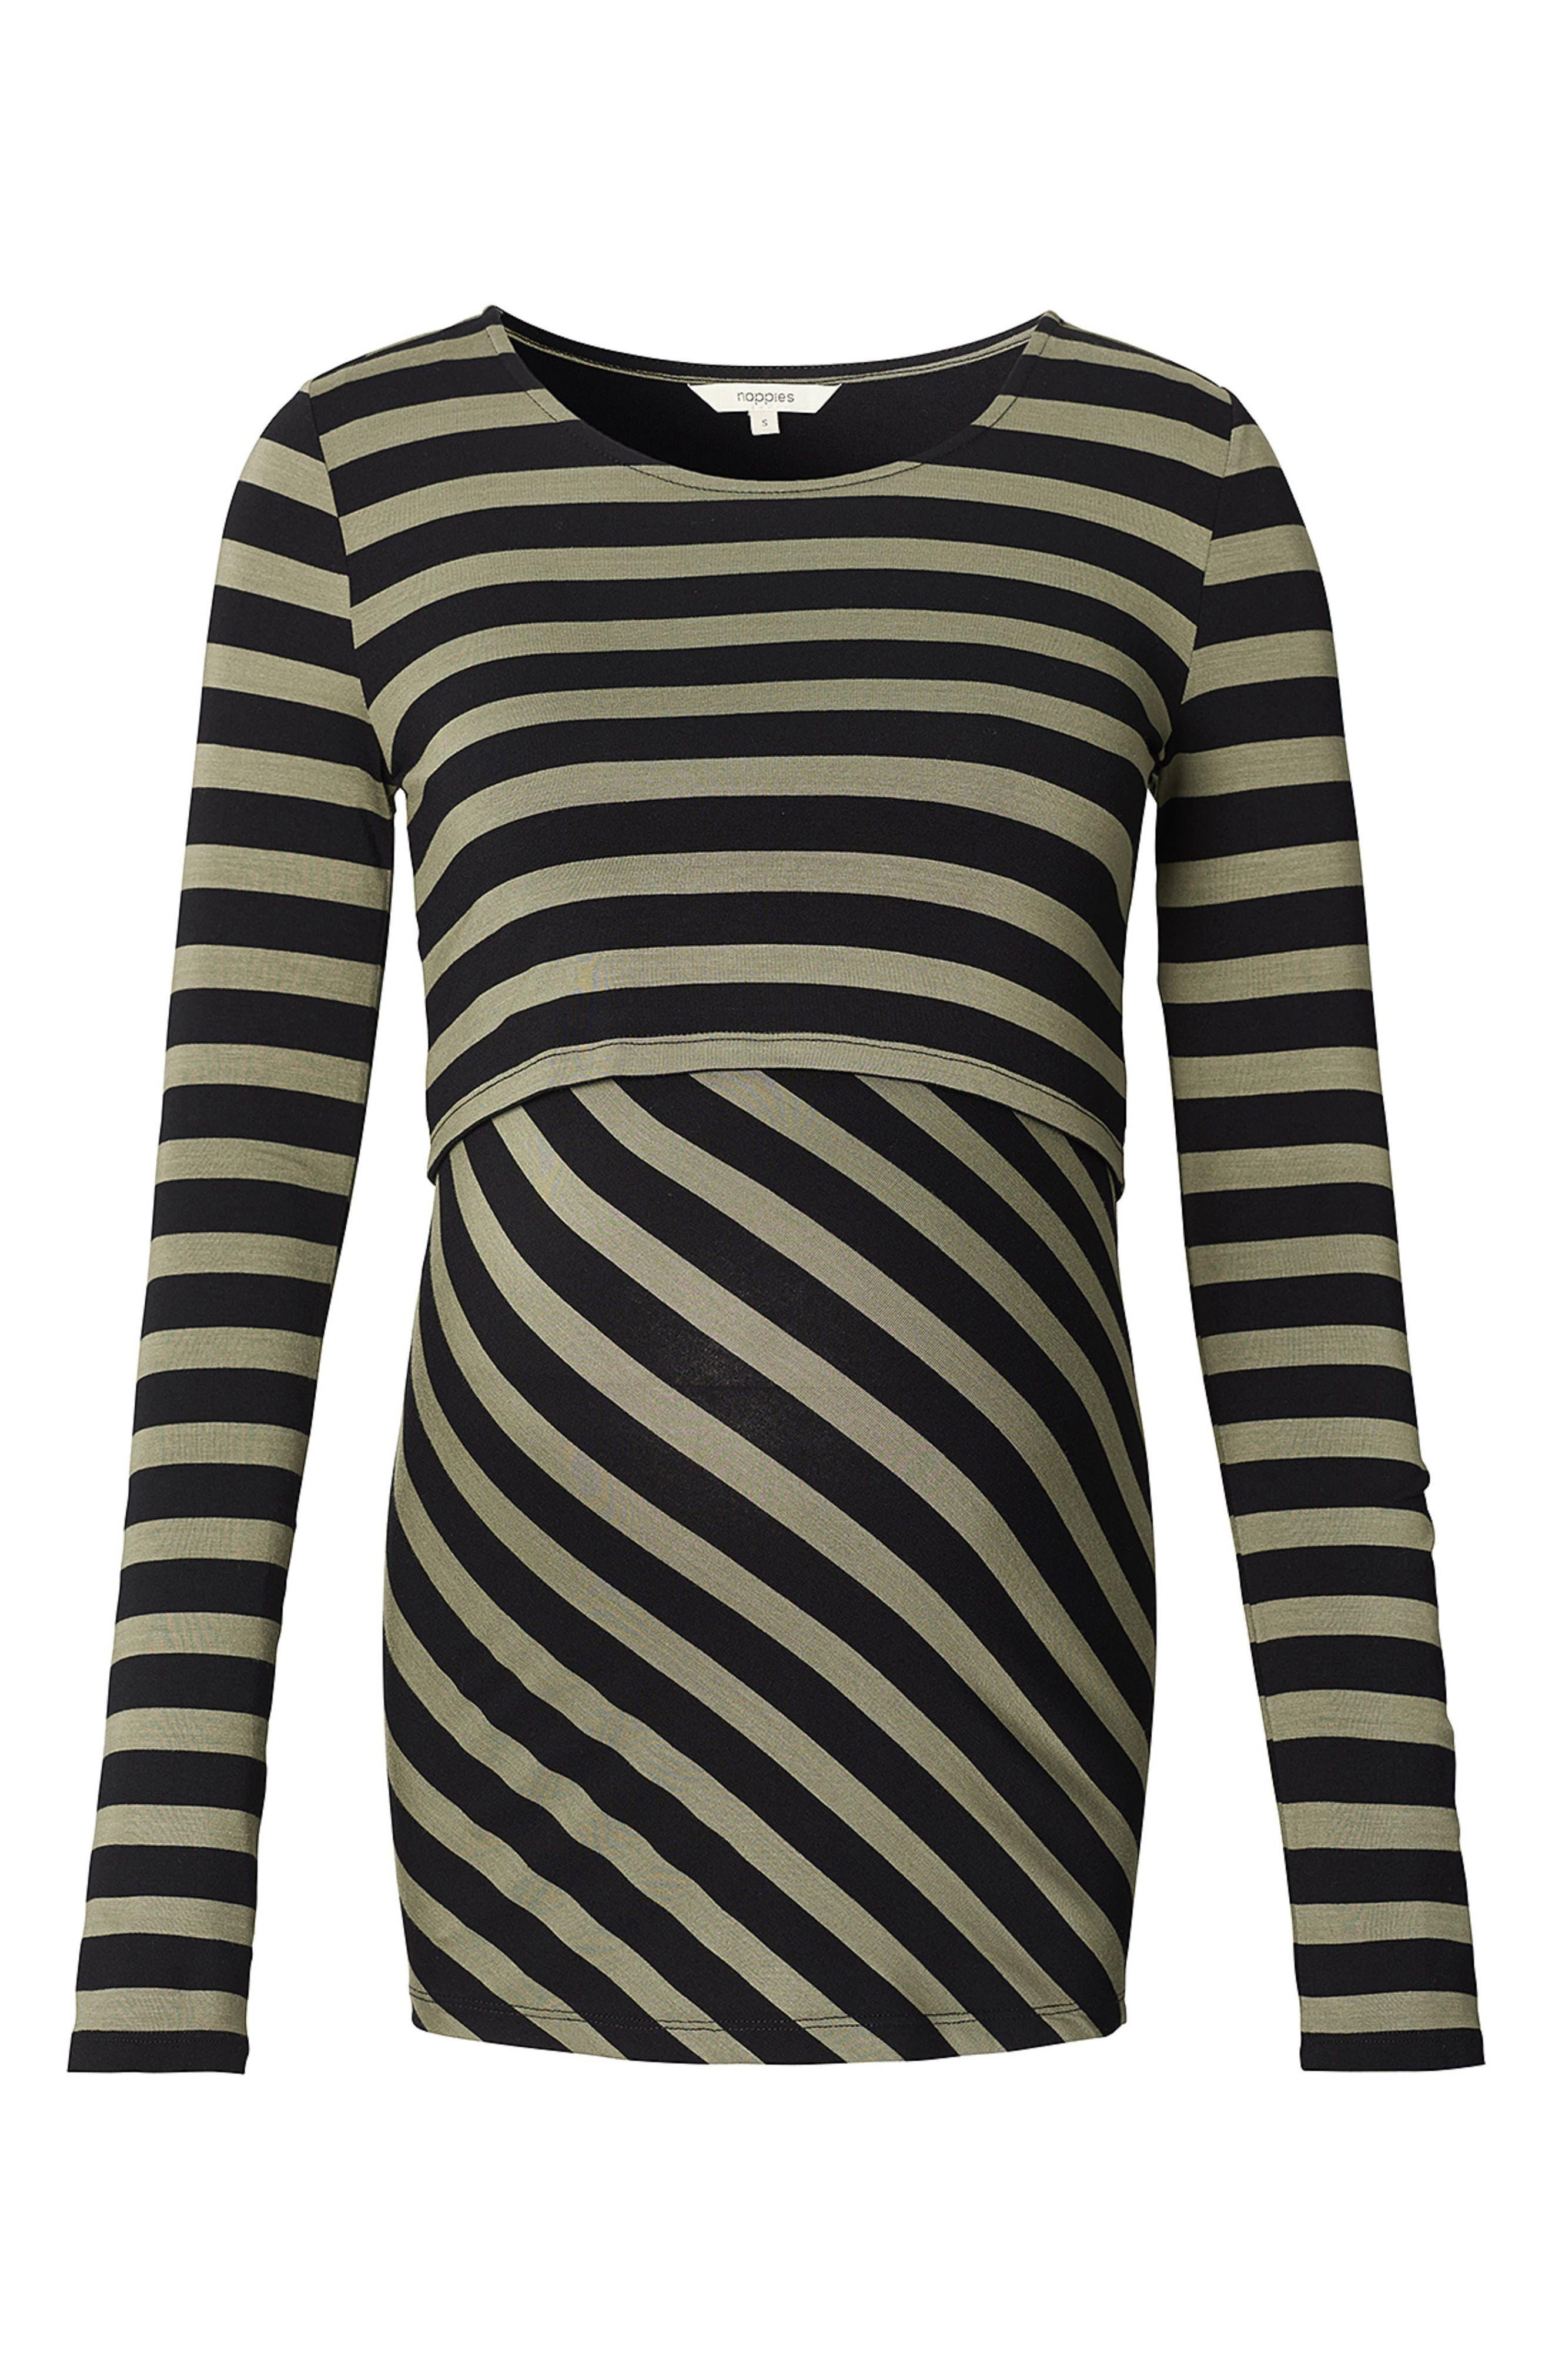 Harper Long Sleeve Maternity/Nursing Tee,                         Main,                         color, Army Stripe